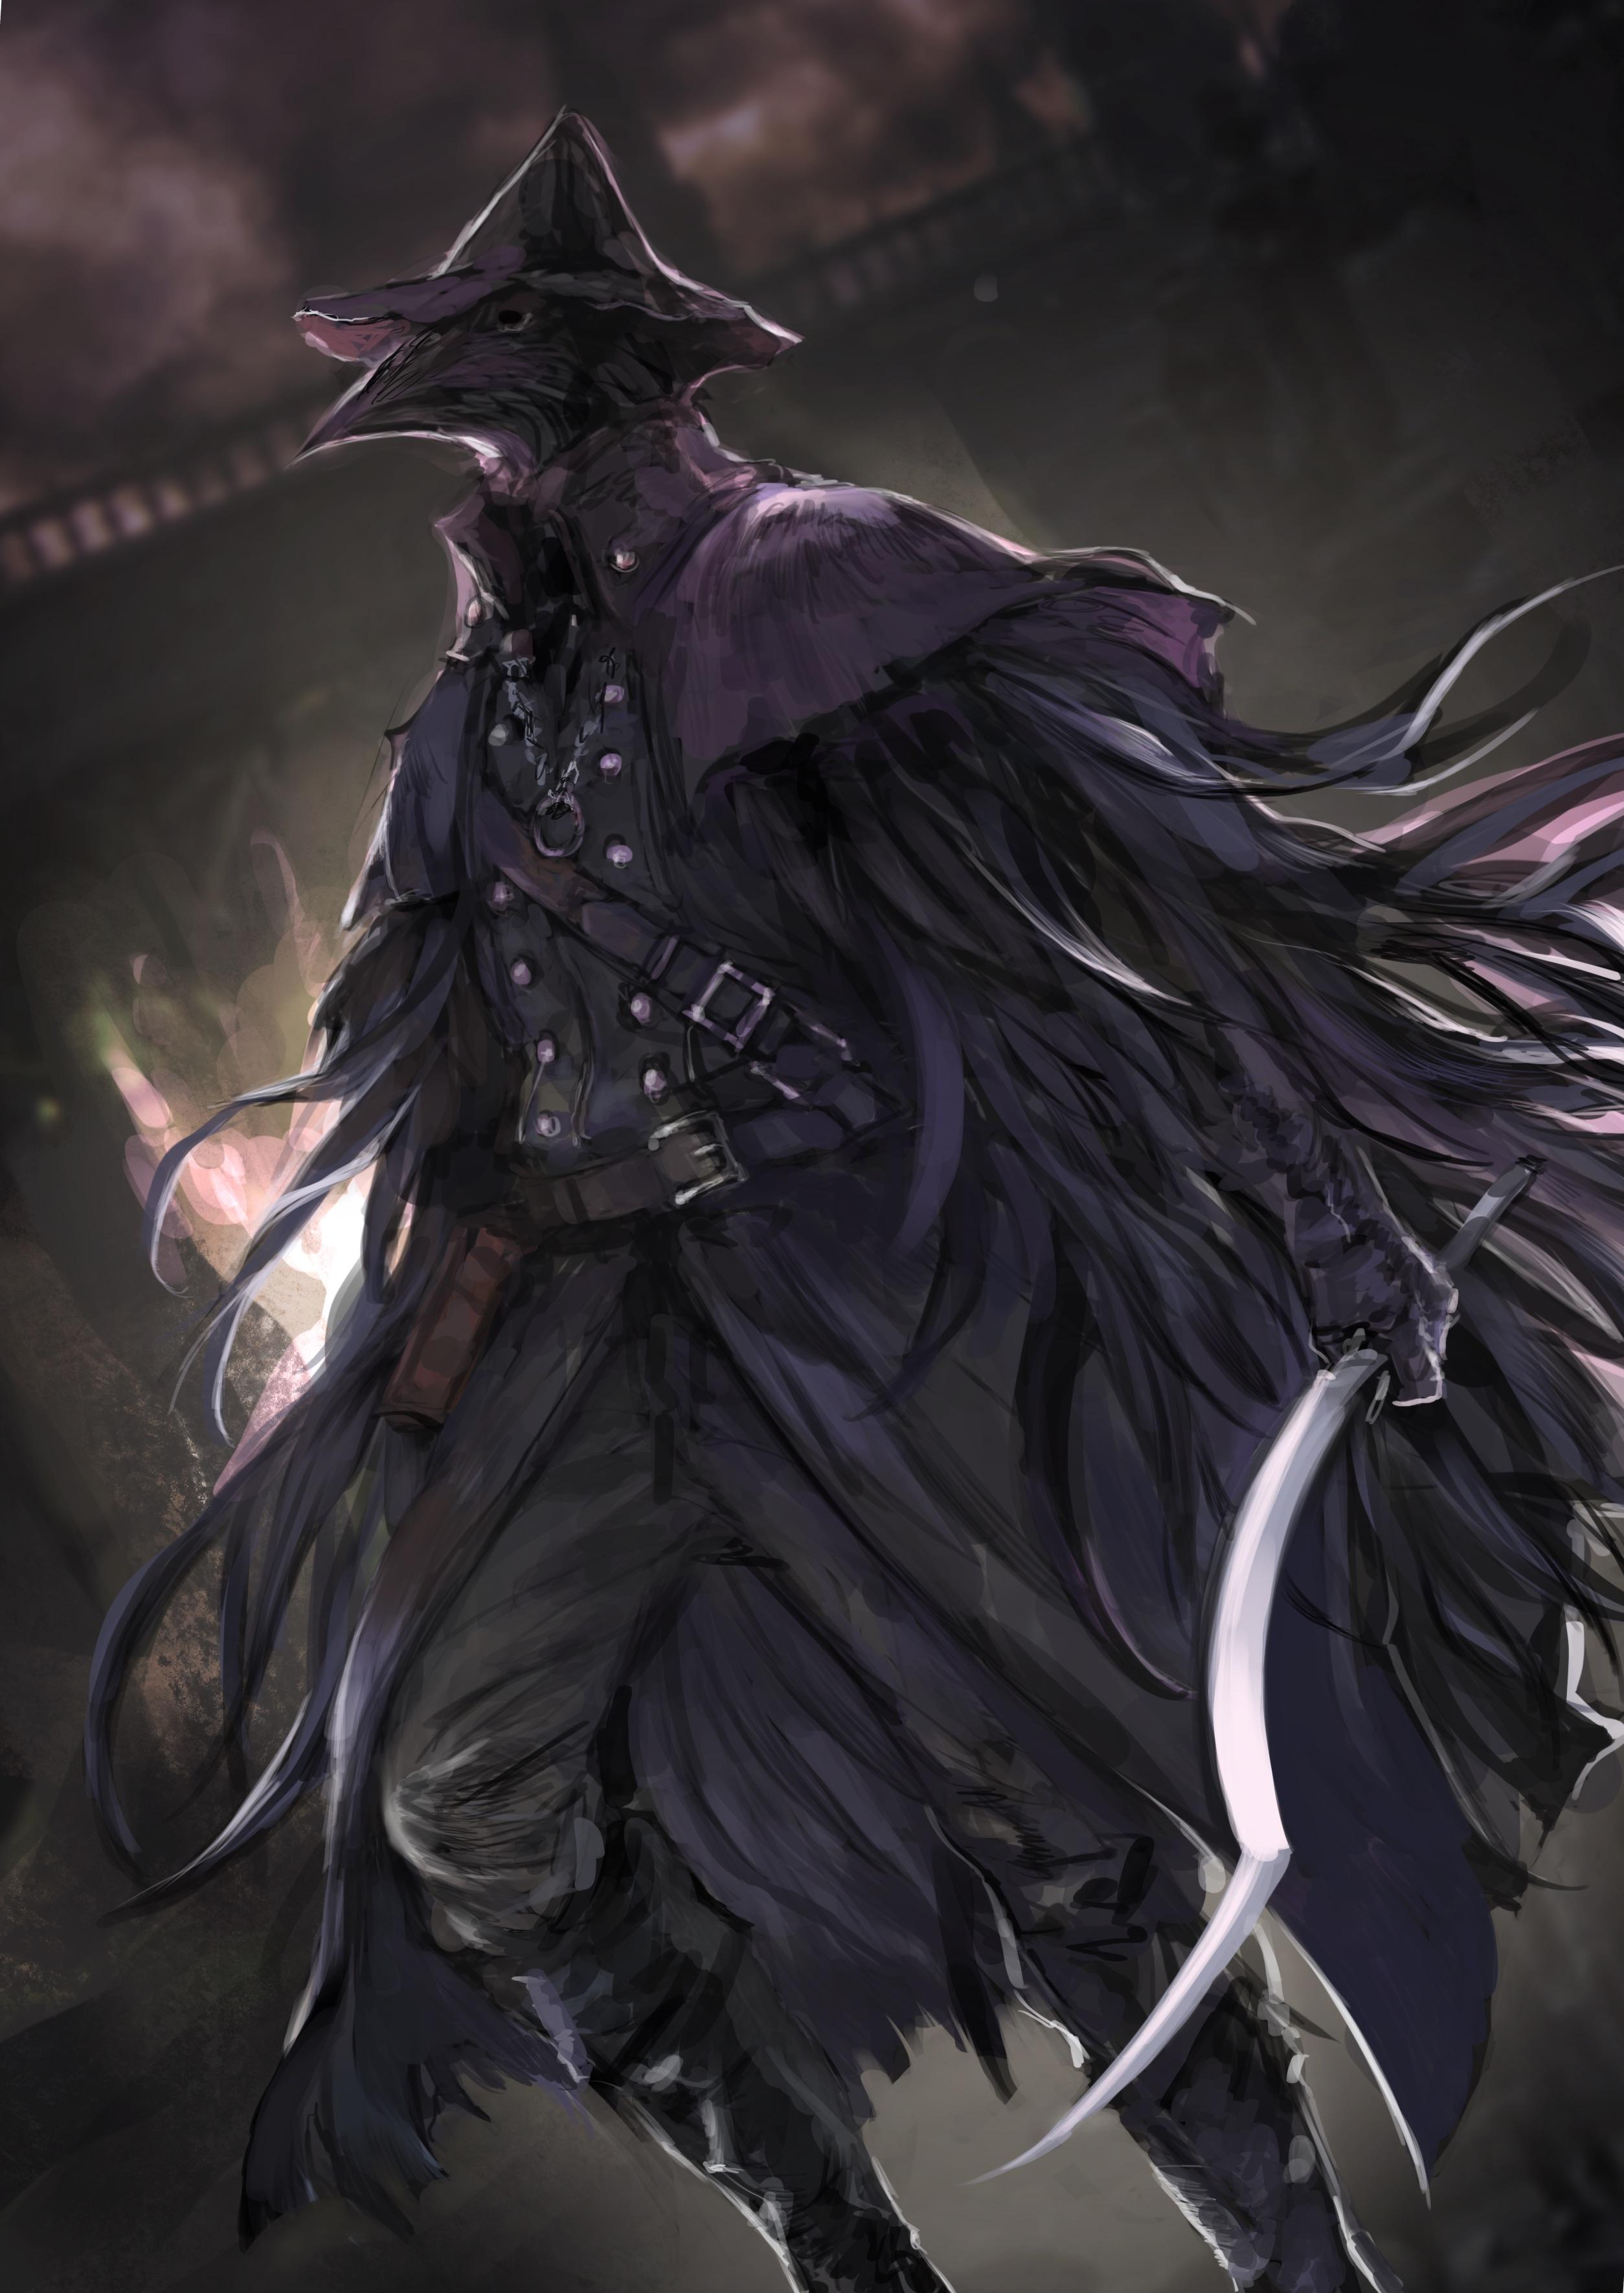 Anna Bloodfallen [Ficha] __eileen_the_crow_bloodborne_drawn_by_nira_nira_box__ec450de8f5d326871aded4a458b5578c